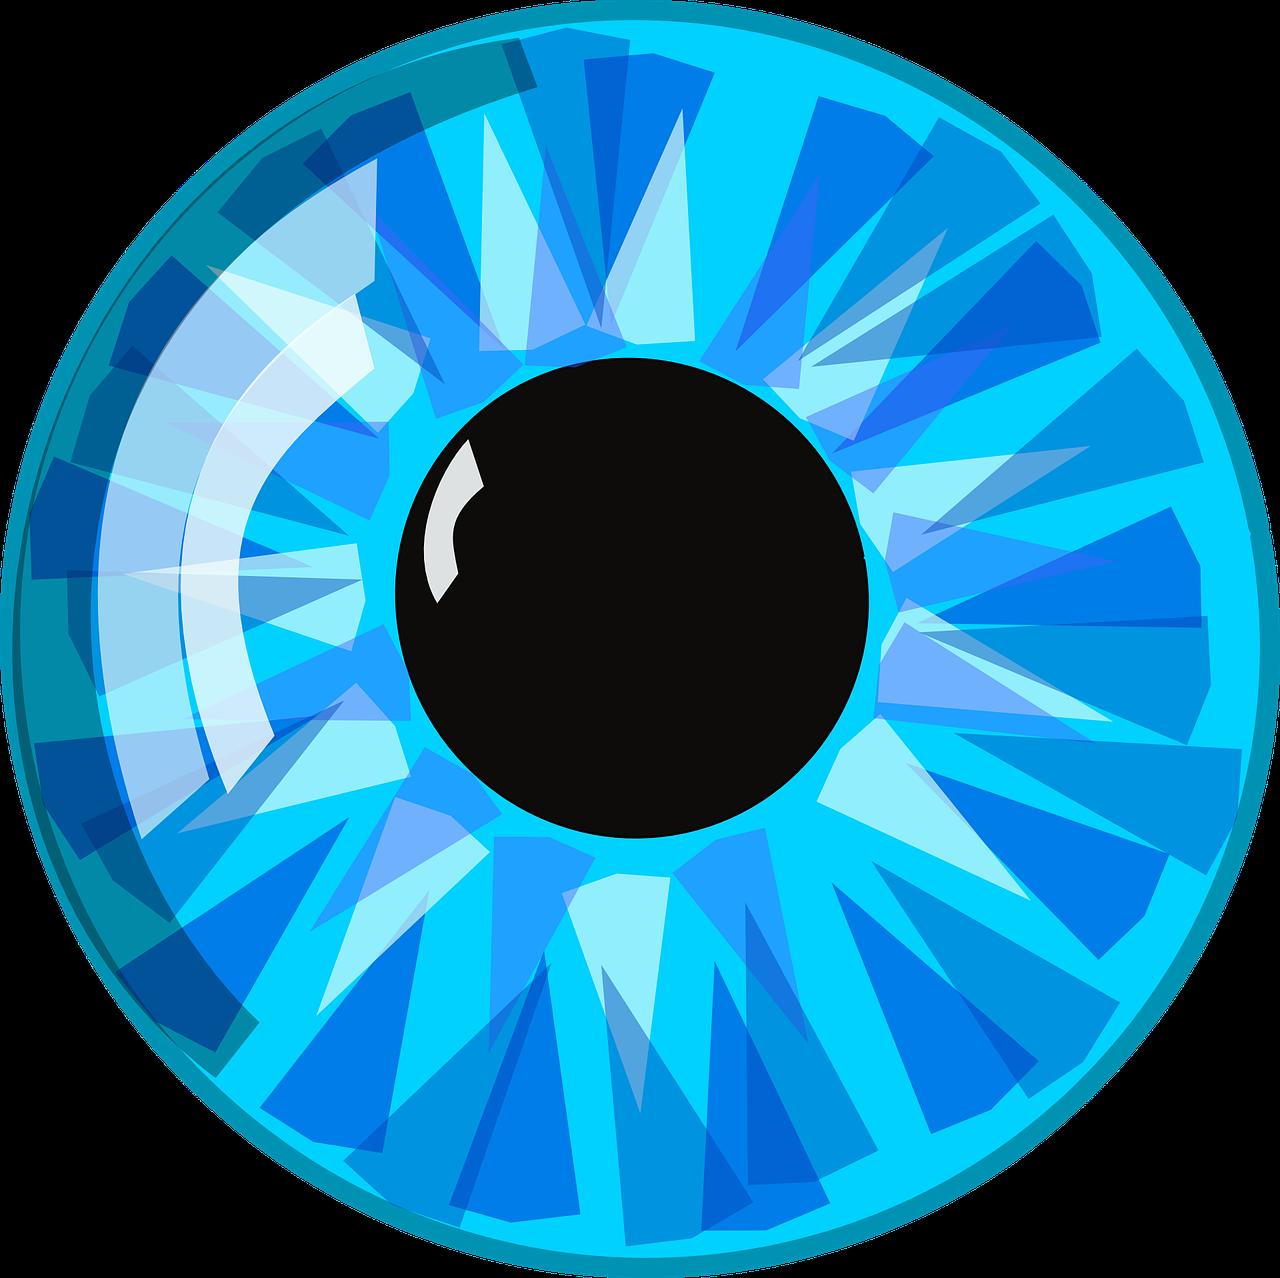 Blue pupil eyeball iris. Eyeballs clipart male eye